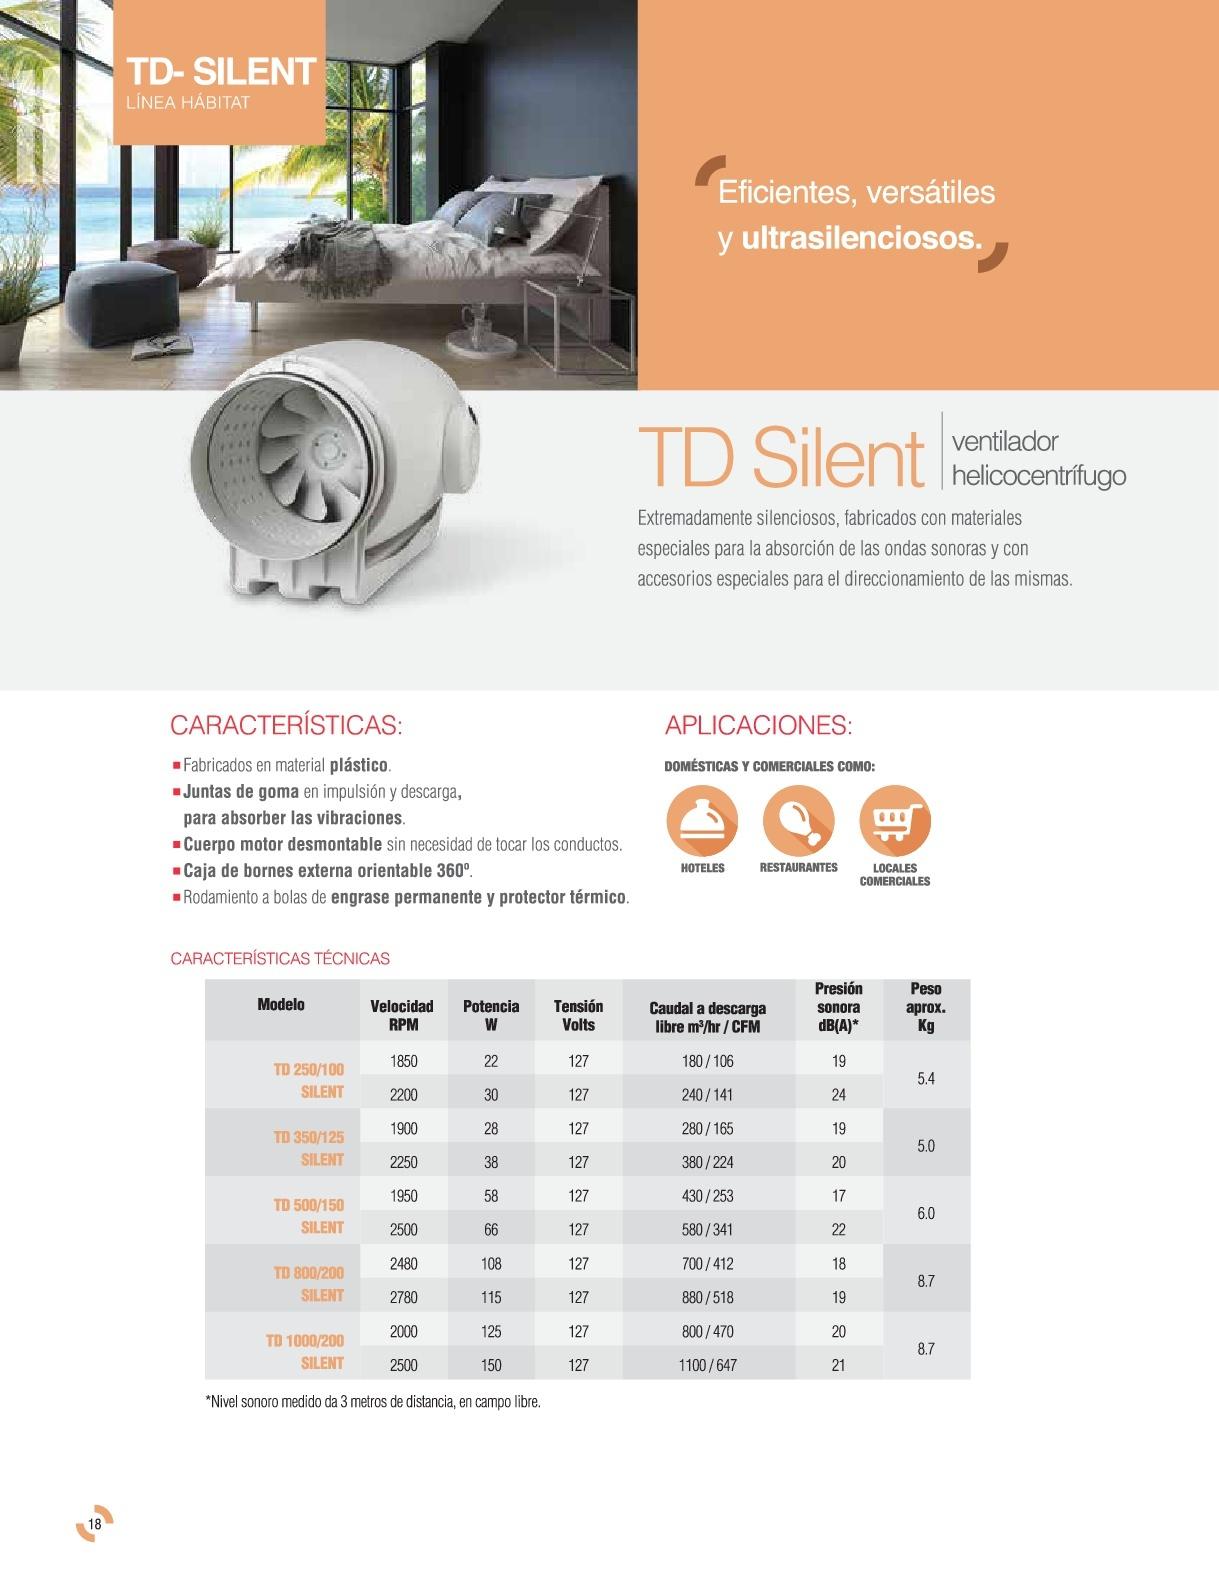 TD-SILENT-001